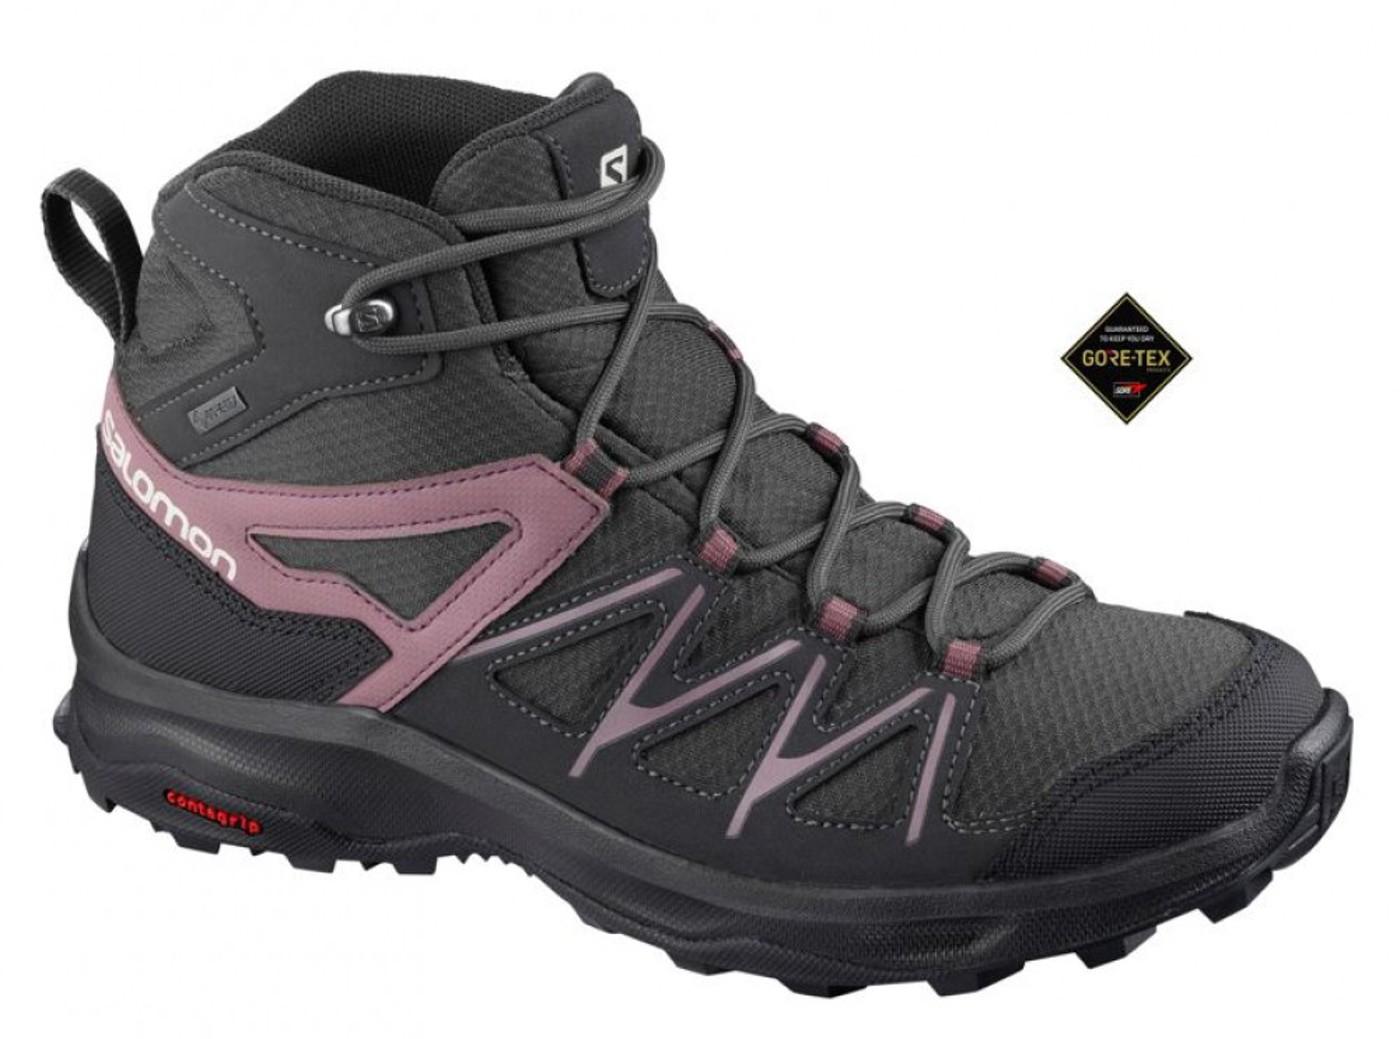 SALOMON Schuhe DAINTREE MID GTX W - Damen